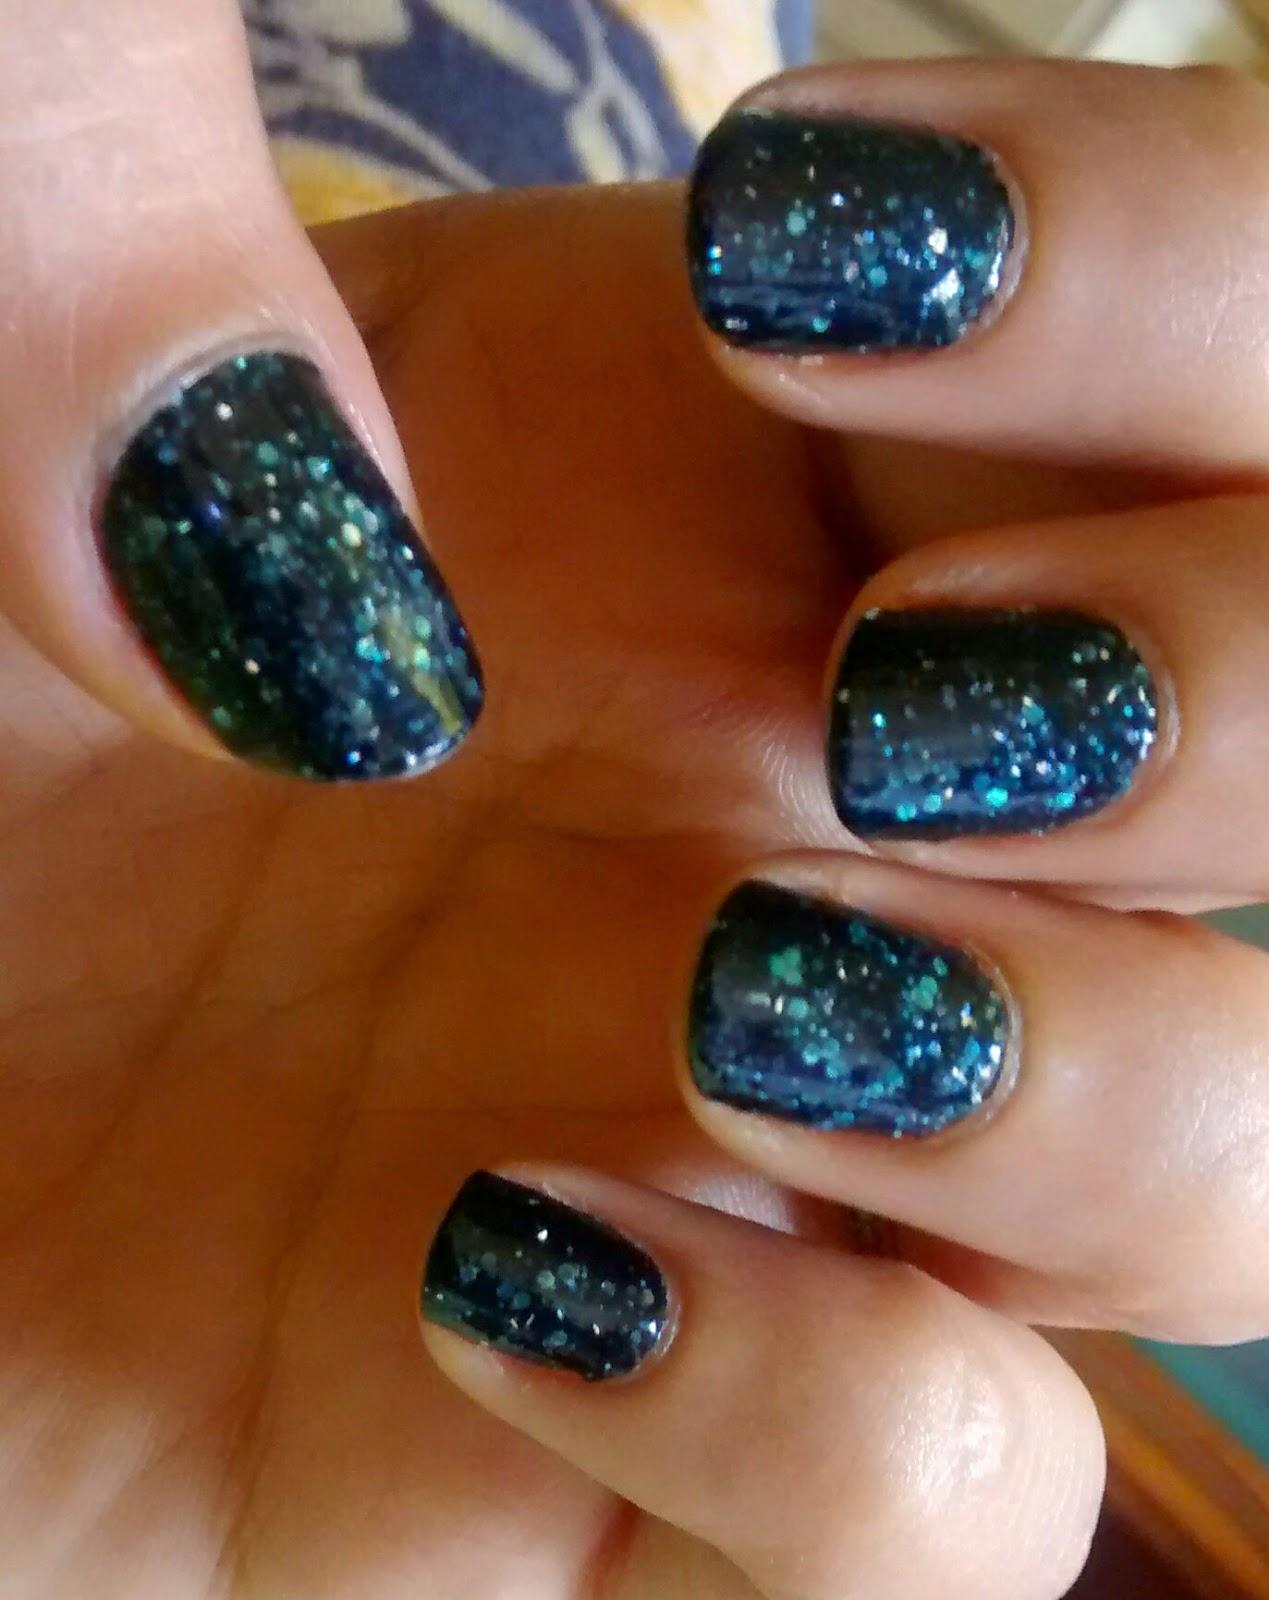 Revlon Nail Enamel - Elusive #474